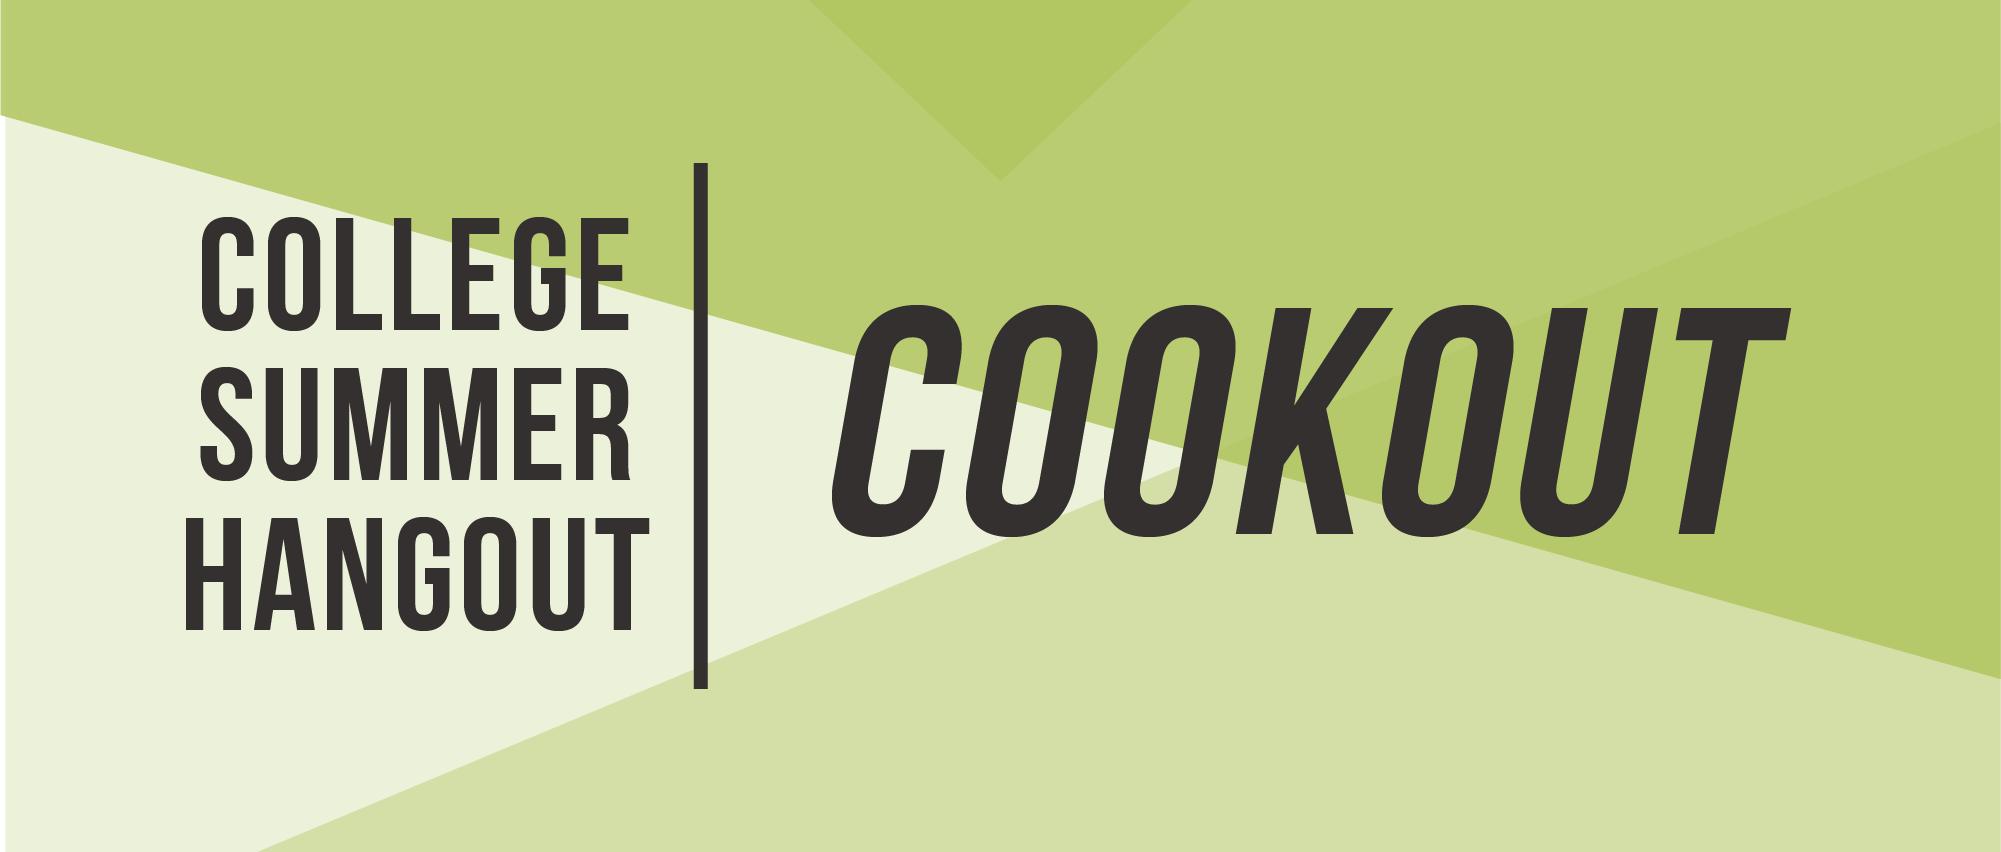 Summer Hangouts_Cookout.png